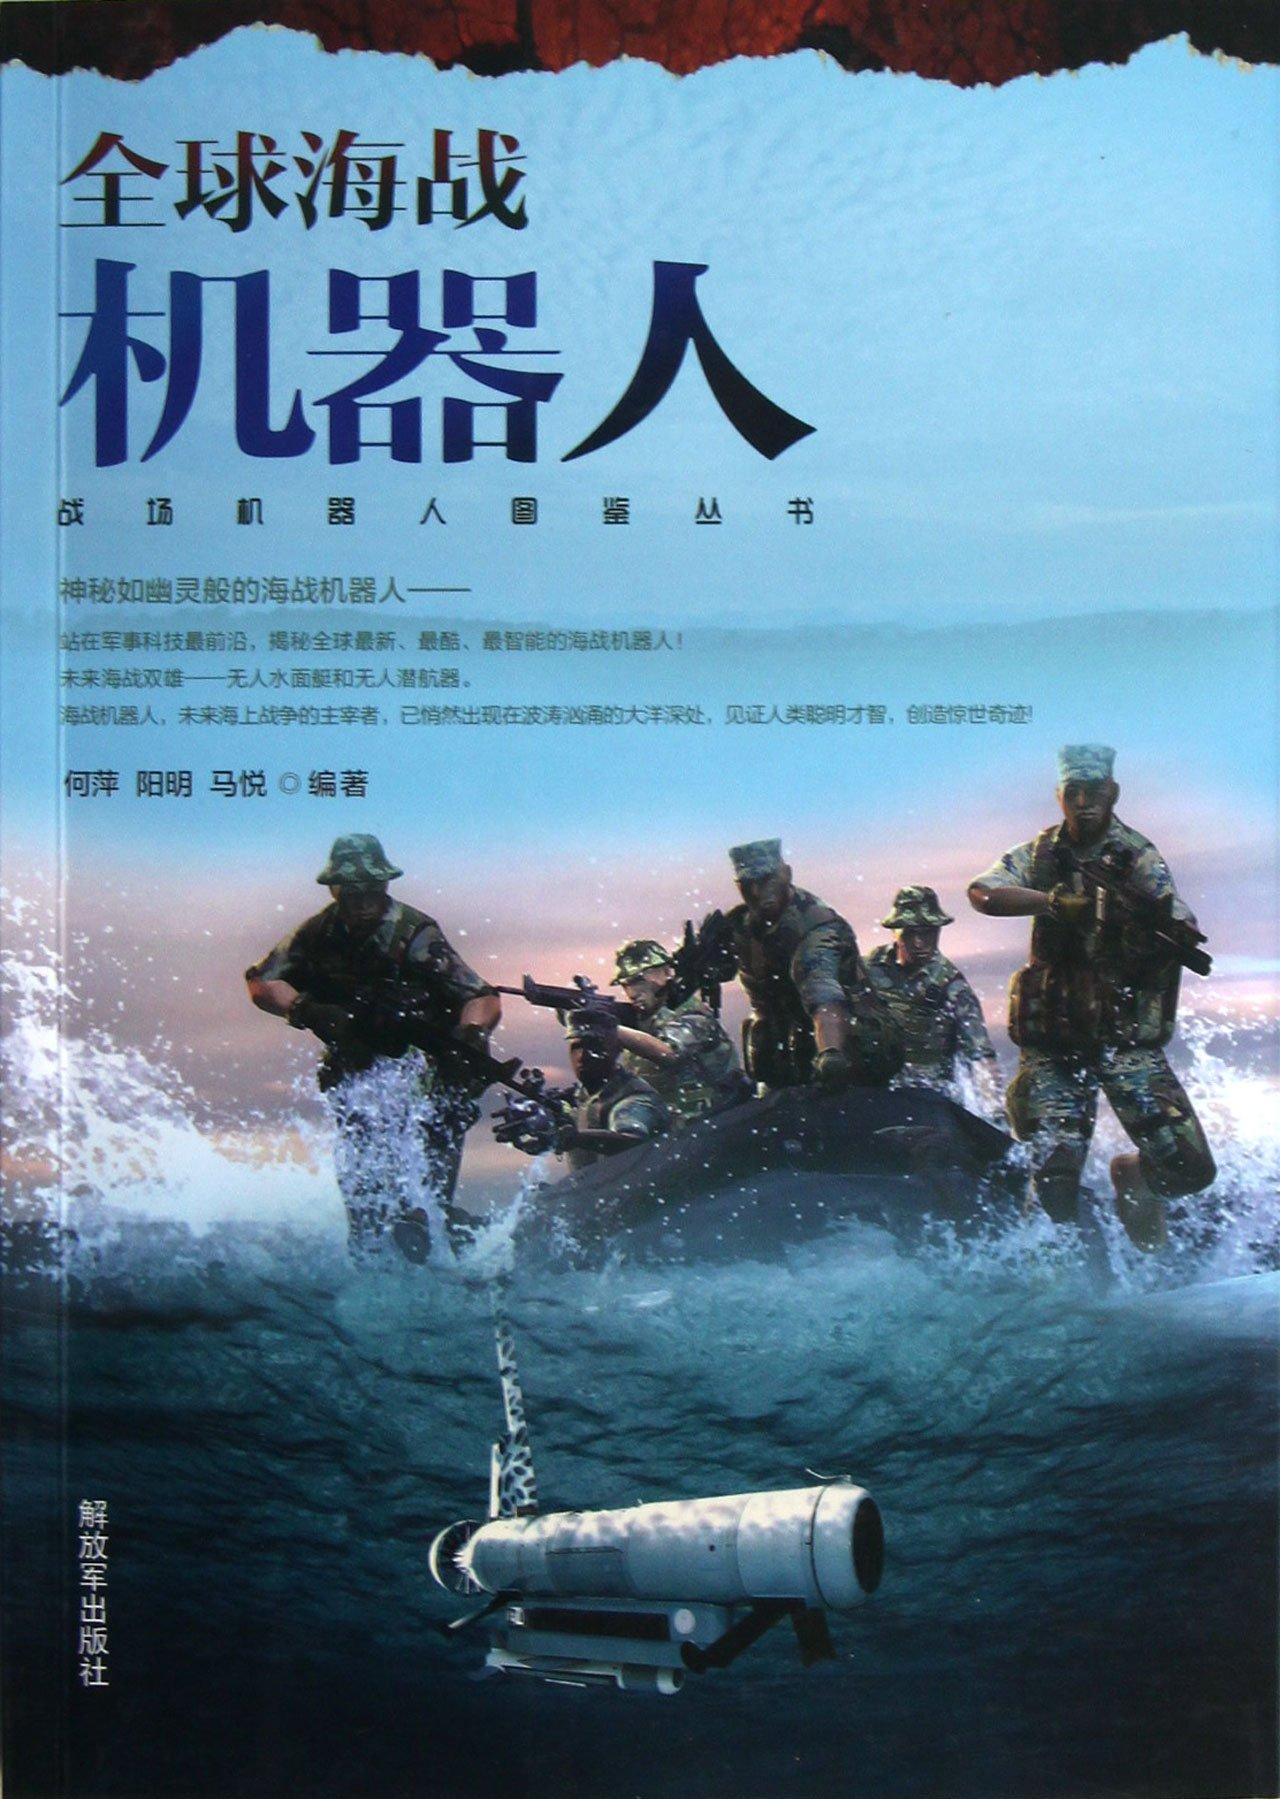 Global Naval Battle Robot / Battlefield Robot Illustrated Handbook Series (Chinese Edition) pdf epub